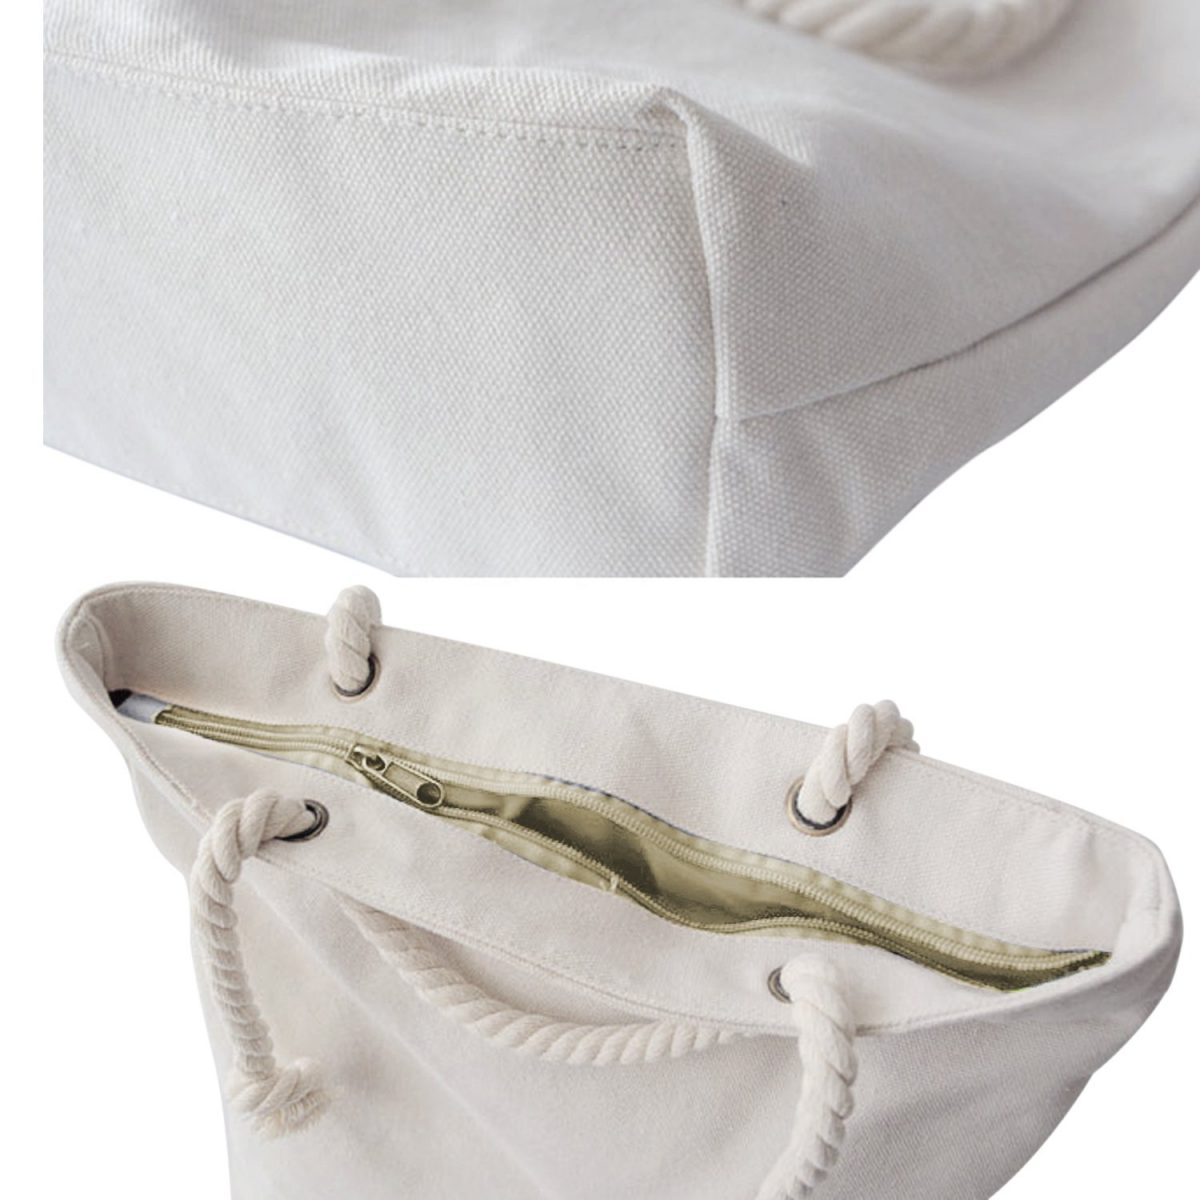 Pembe Gri Ekose Desenli Fermuarlı Modern Kumaş Çanta Realhomes